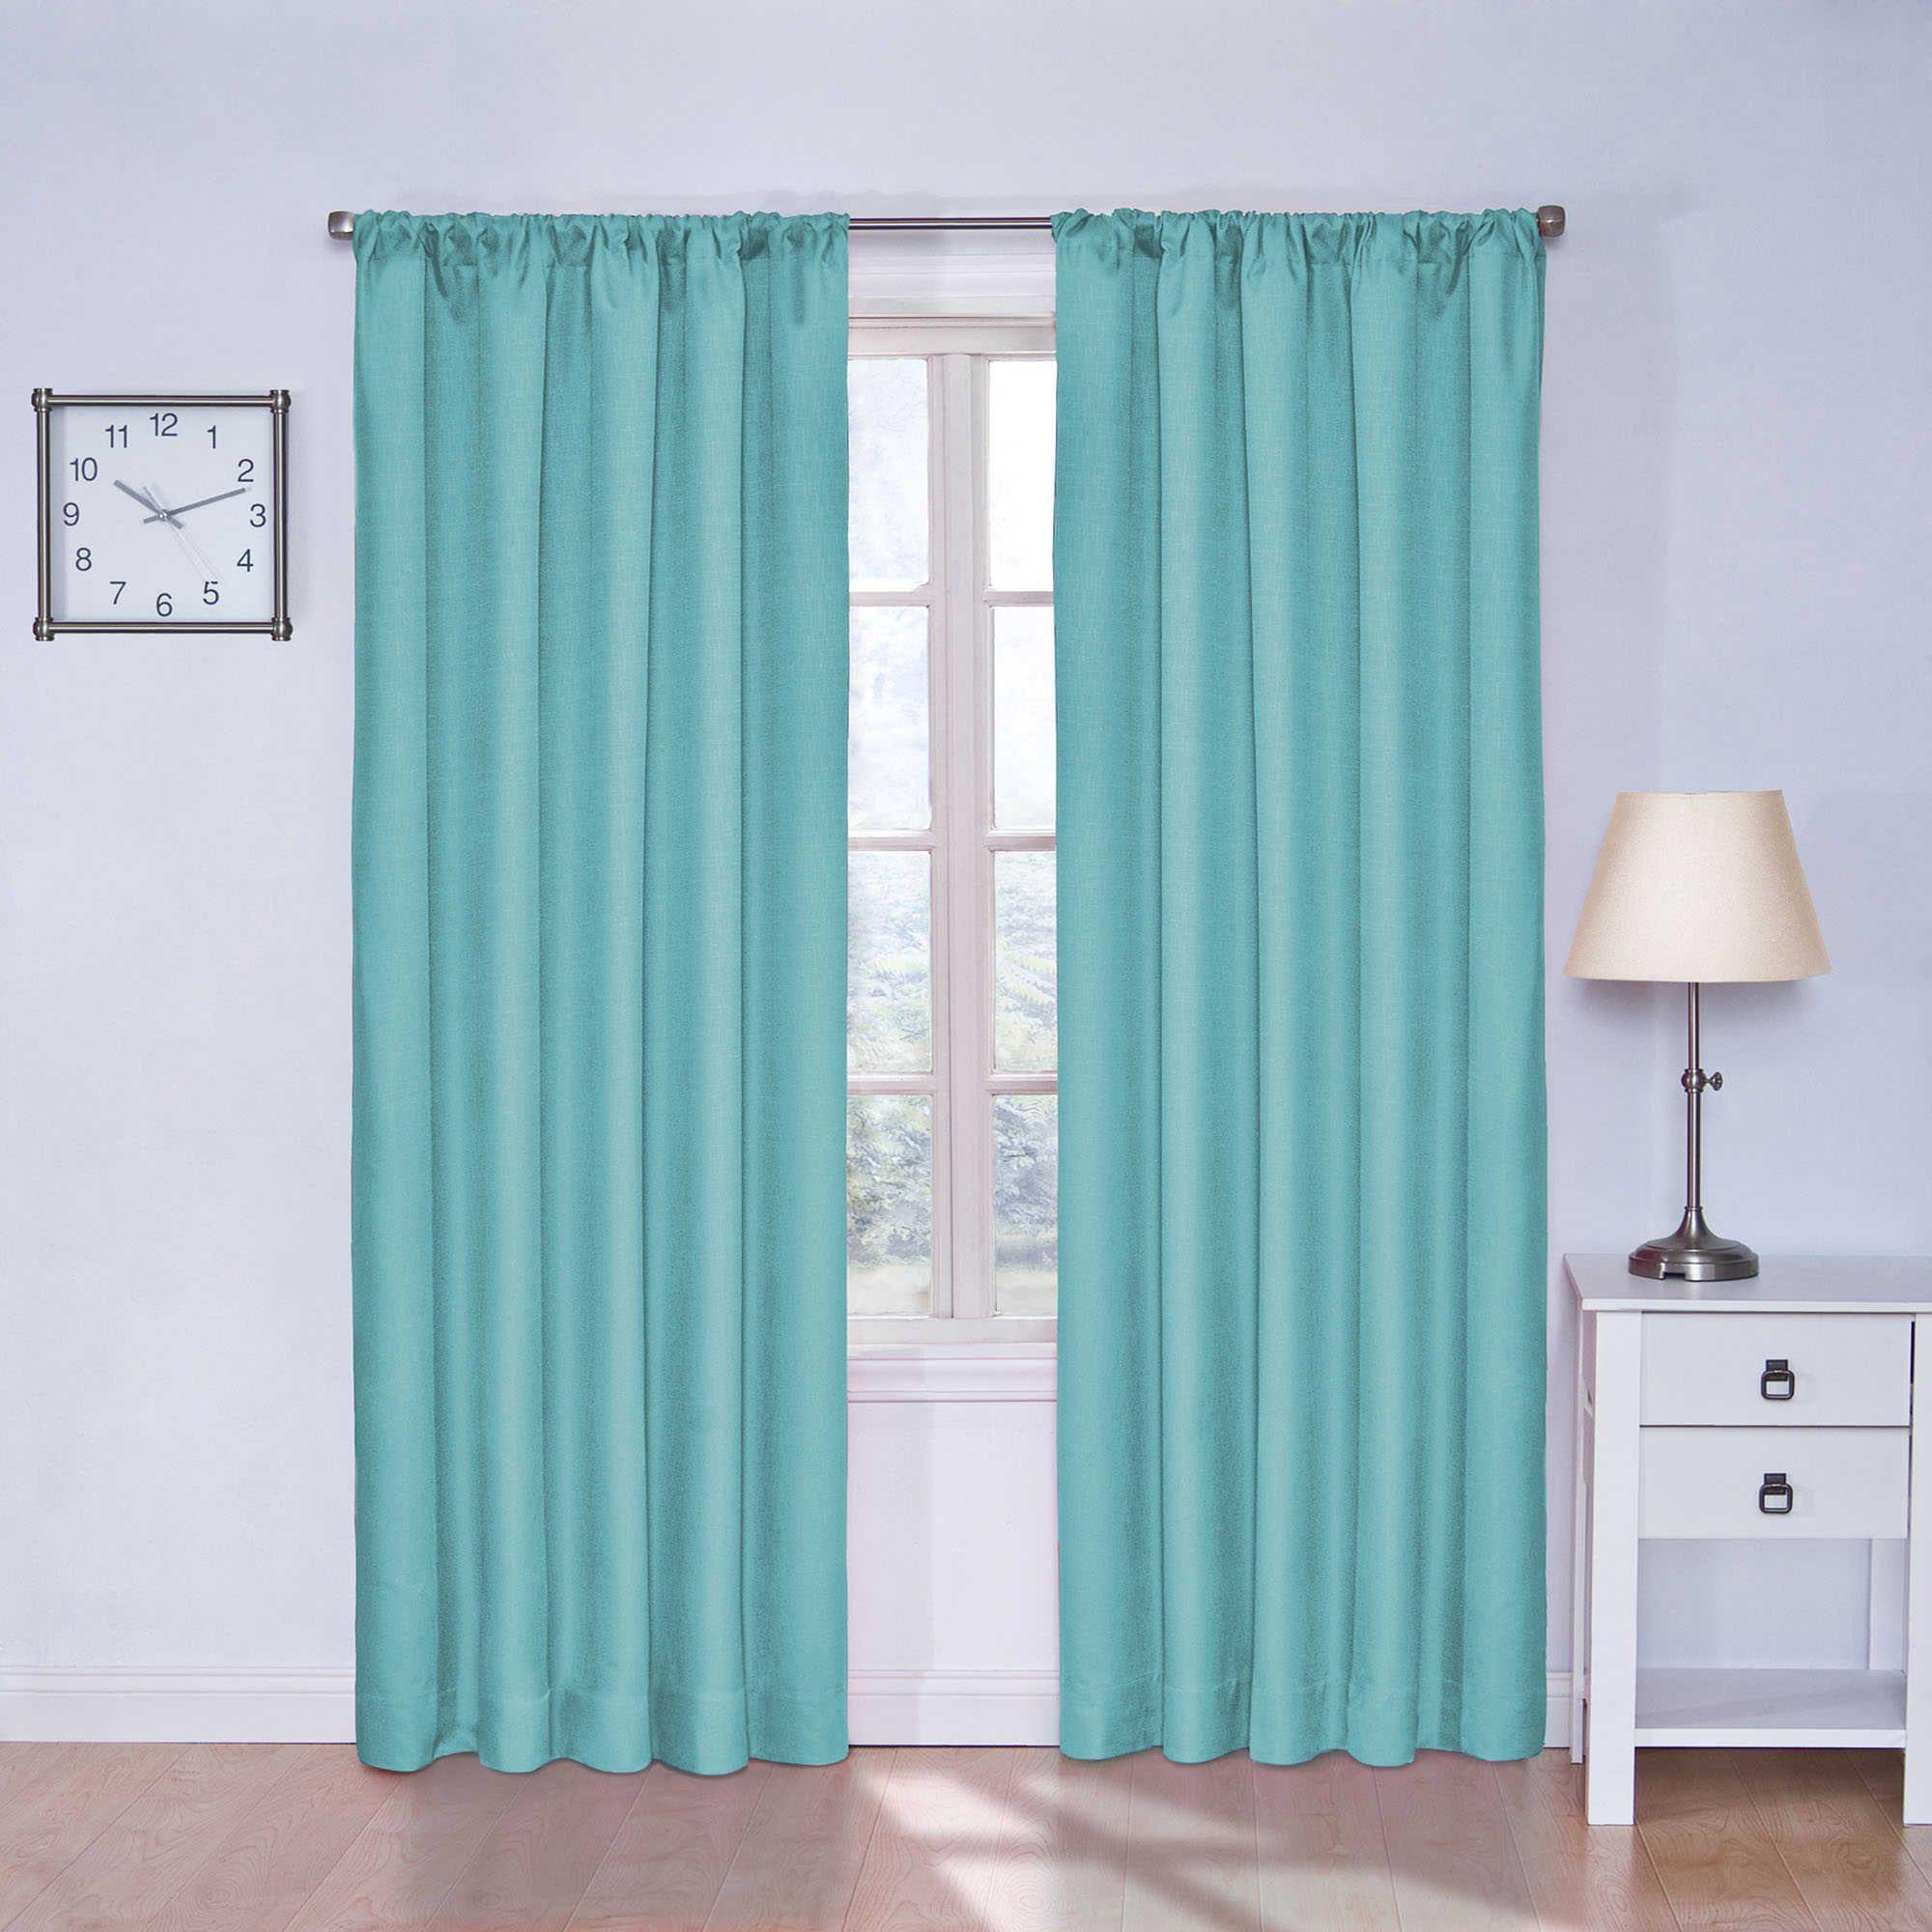 Solarshield kate inch rod pocket room darkening window curtain